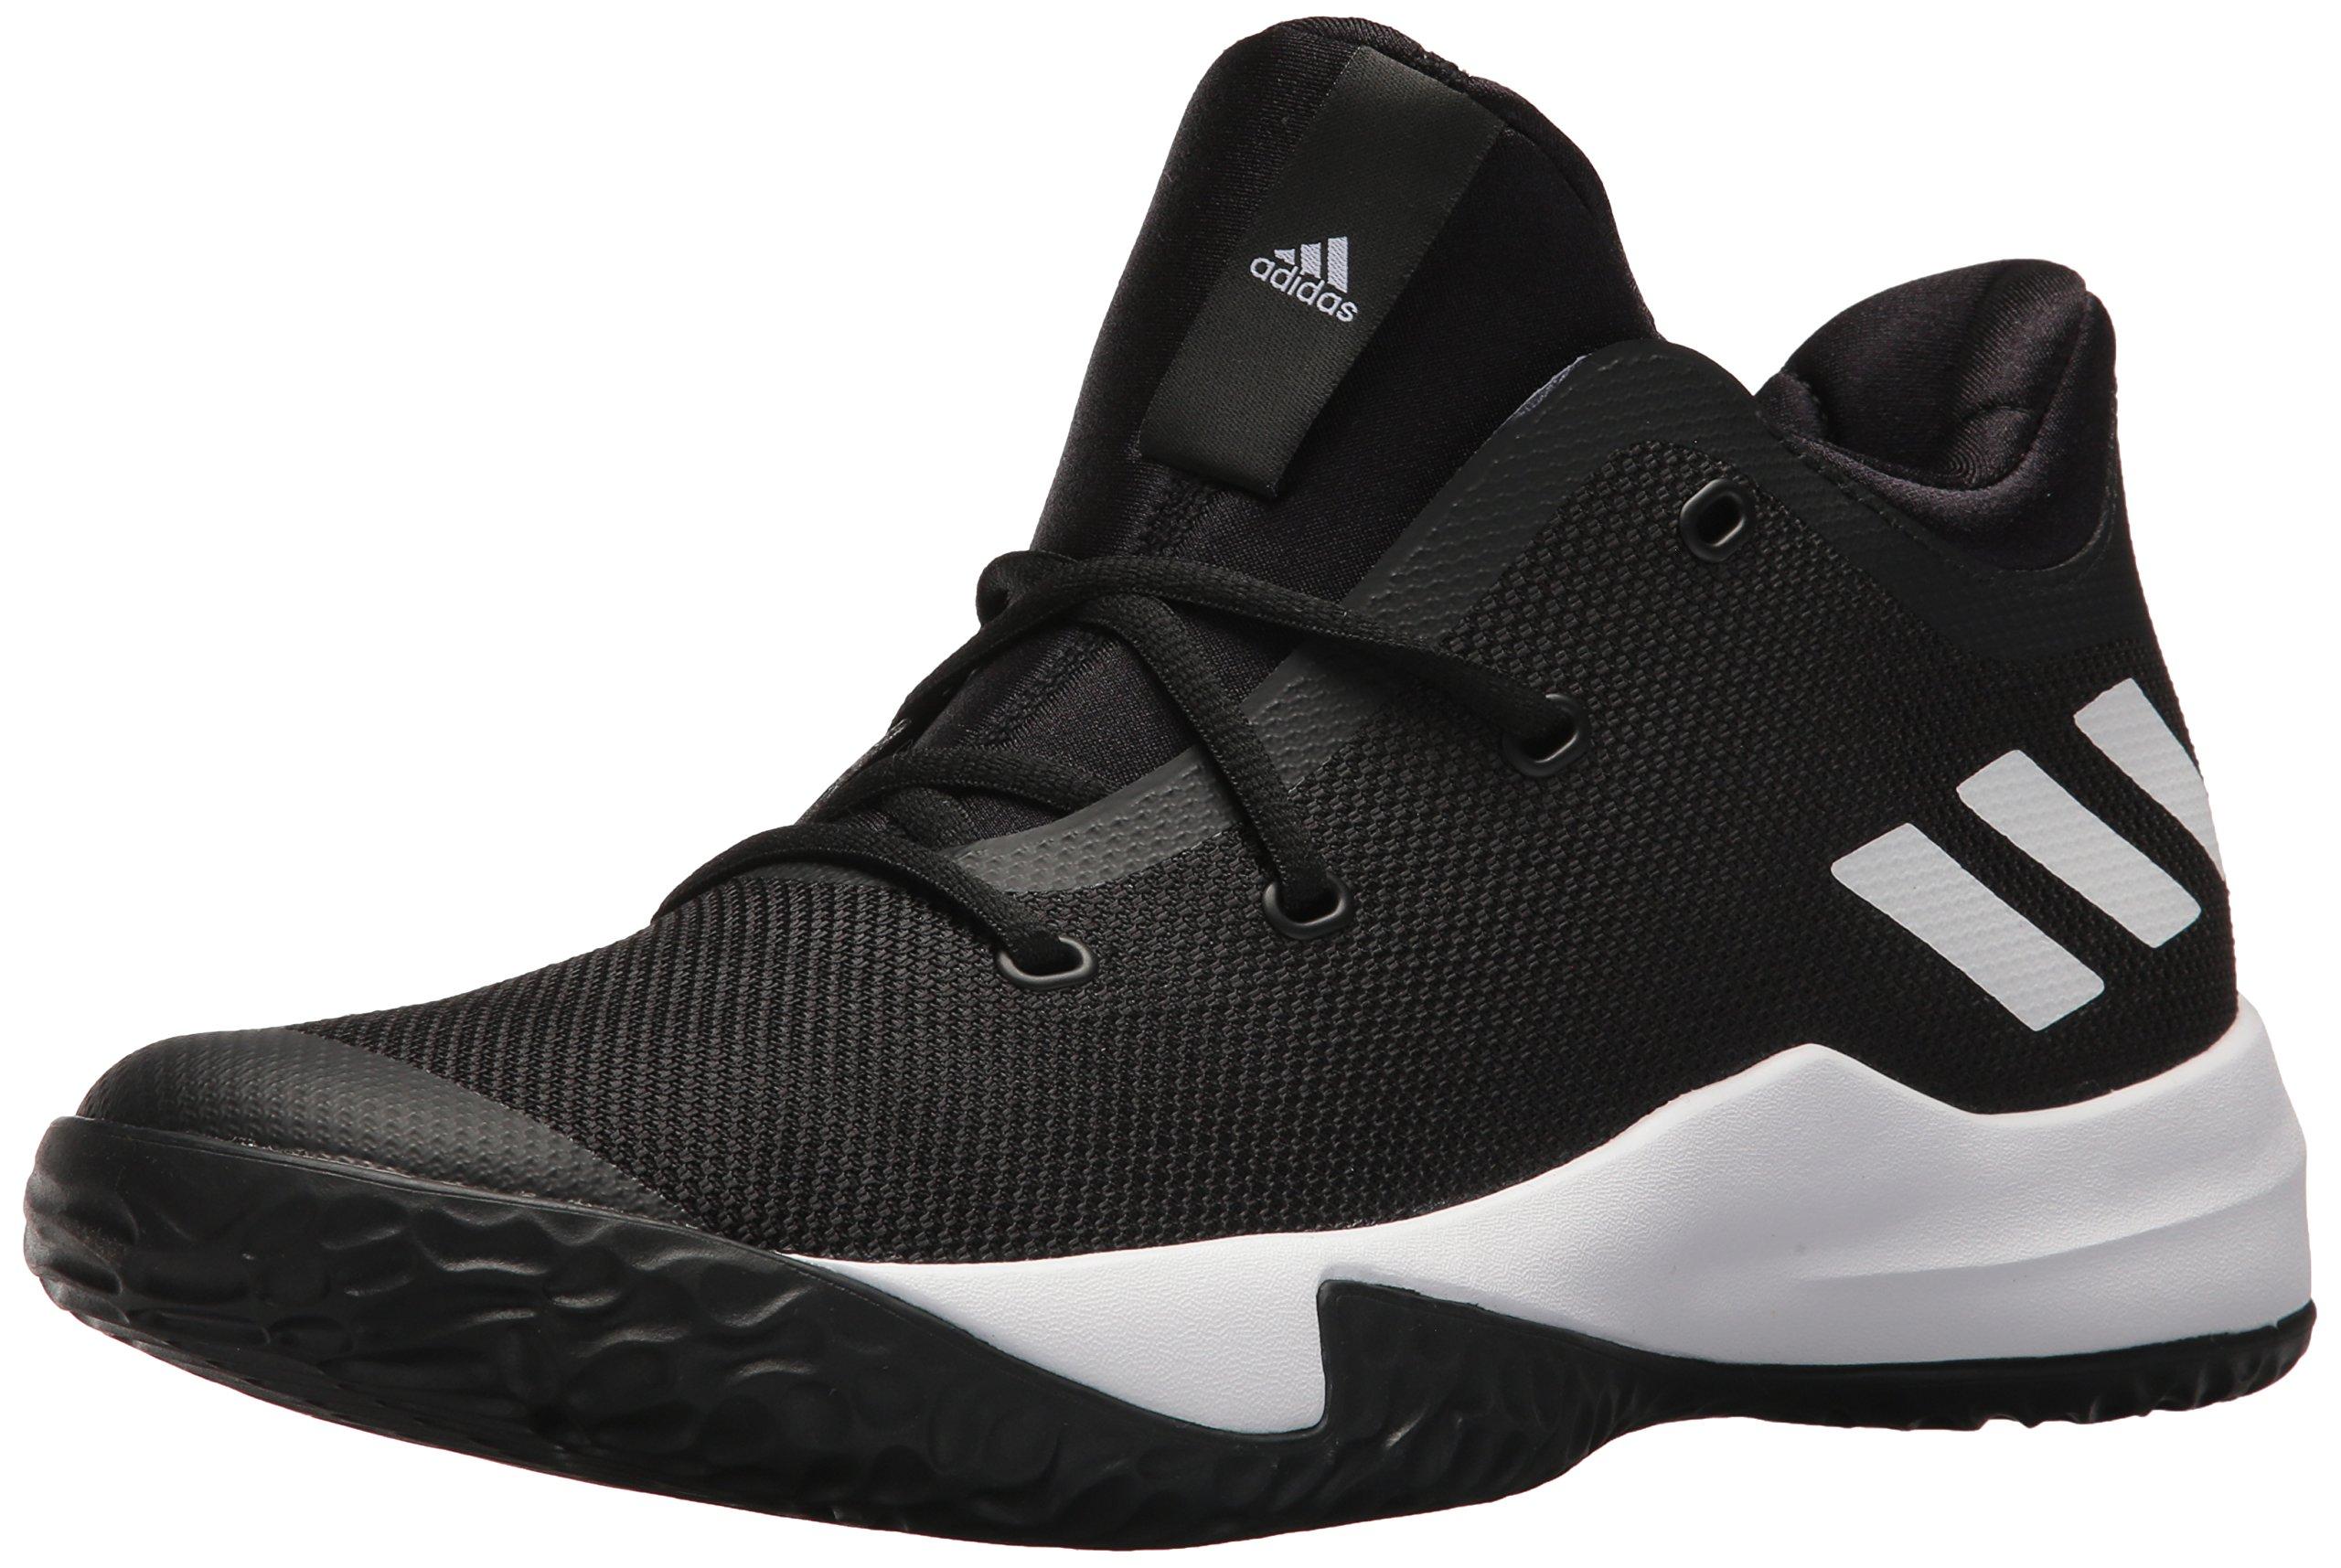 adidas Performance Men's Rise up 2 Basketball Shoe, White/White/White, 12 M US by adidas